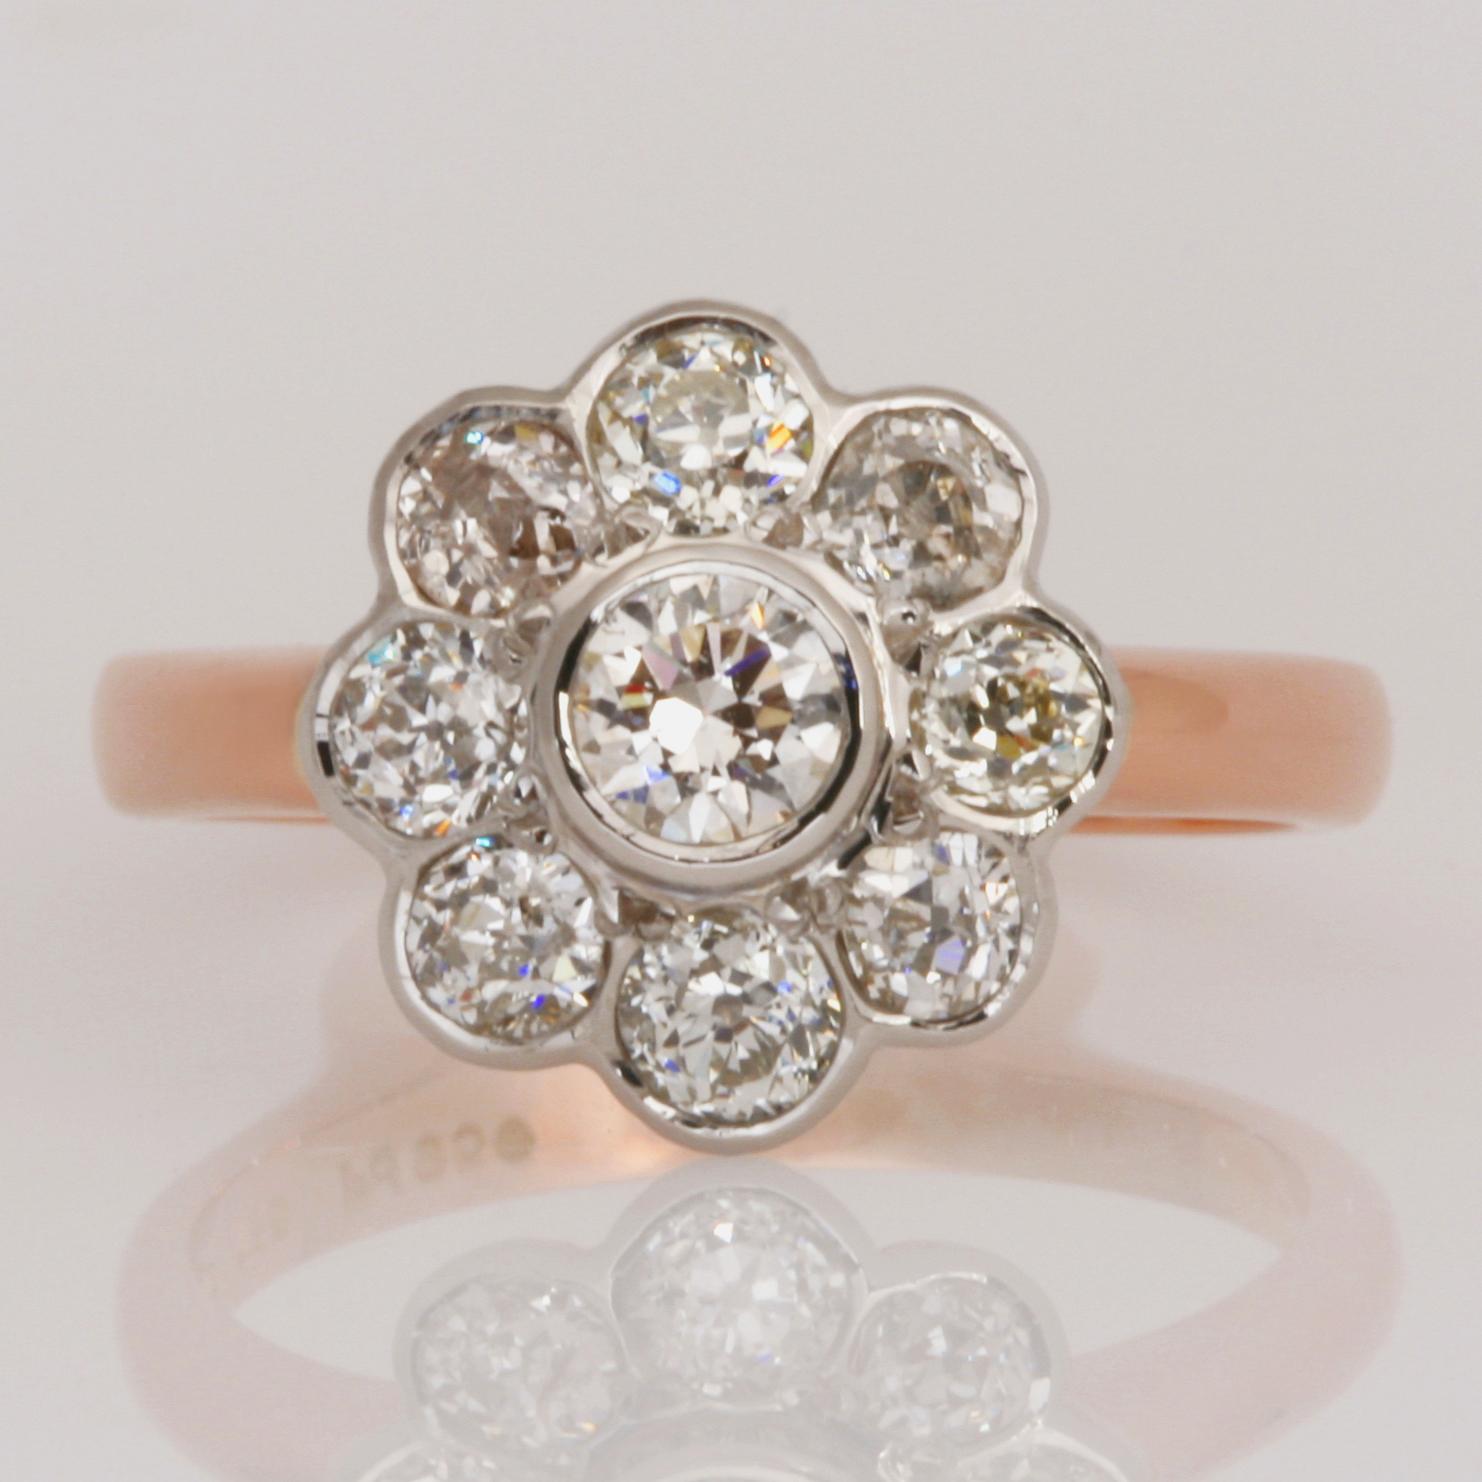 Handmade ladies palladium and 18ct rose gold diamond Engagement ring